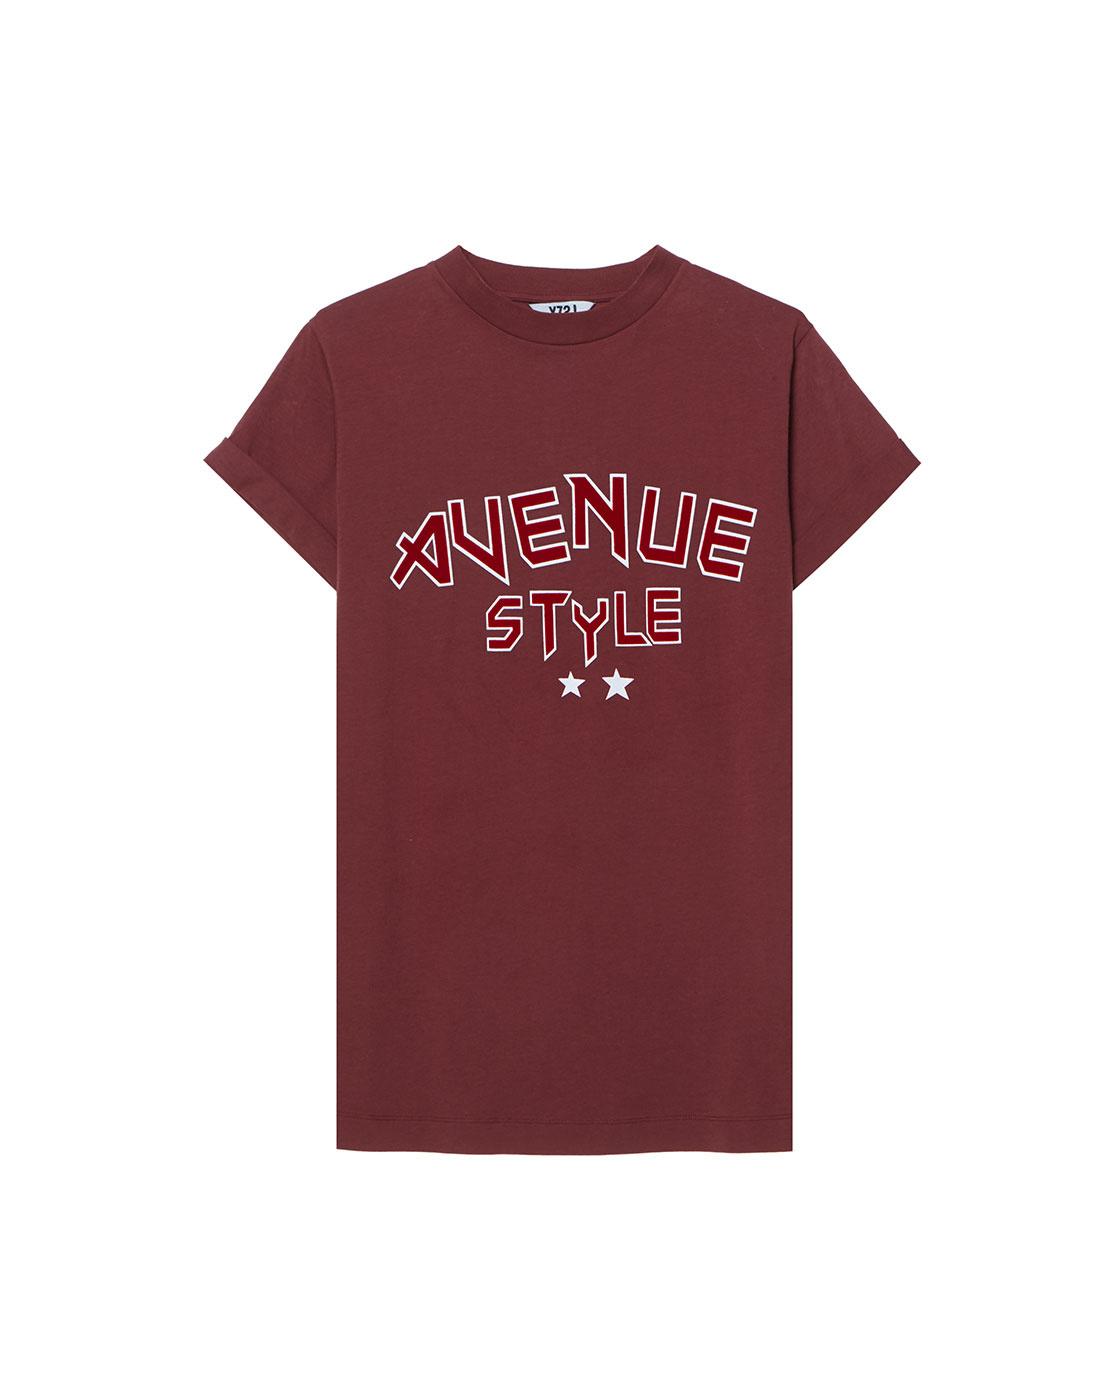 Avenue style tee-1